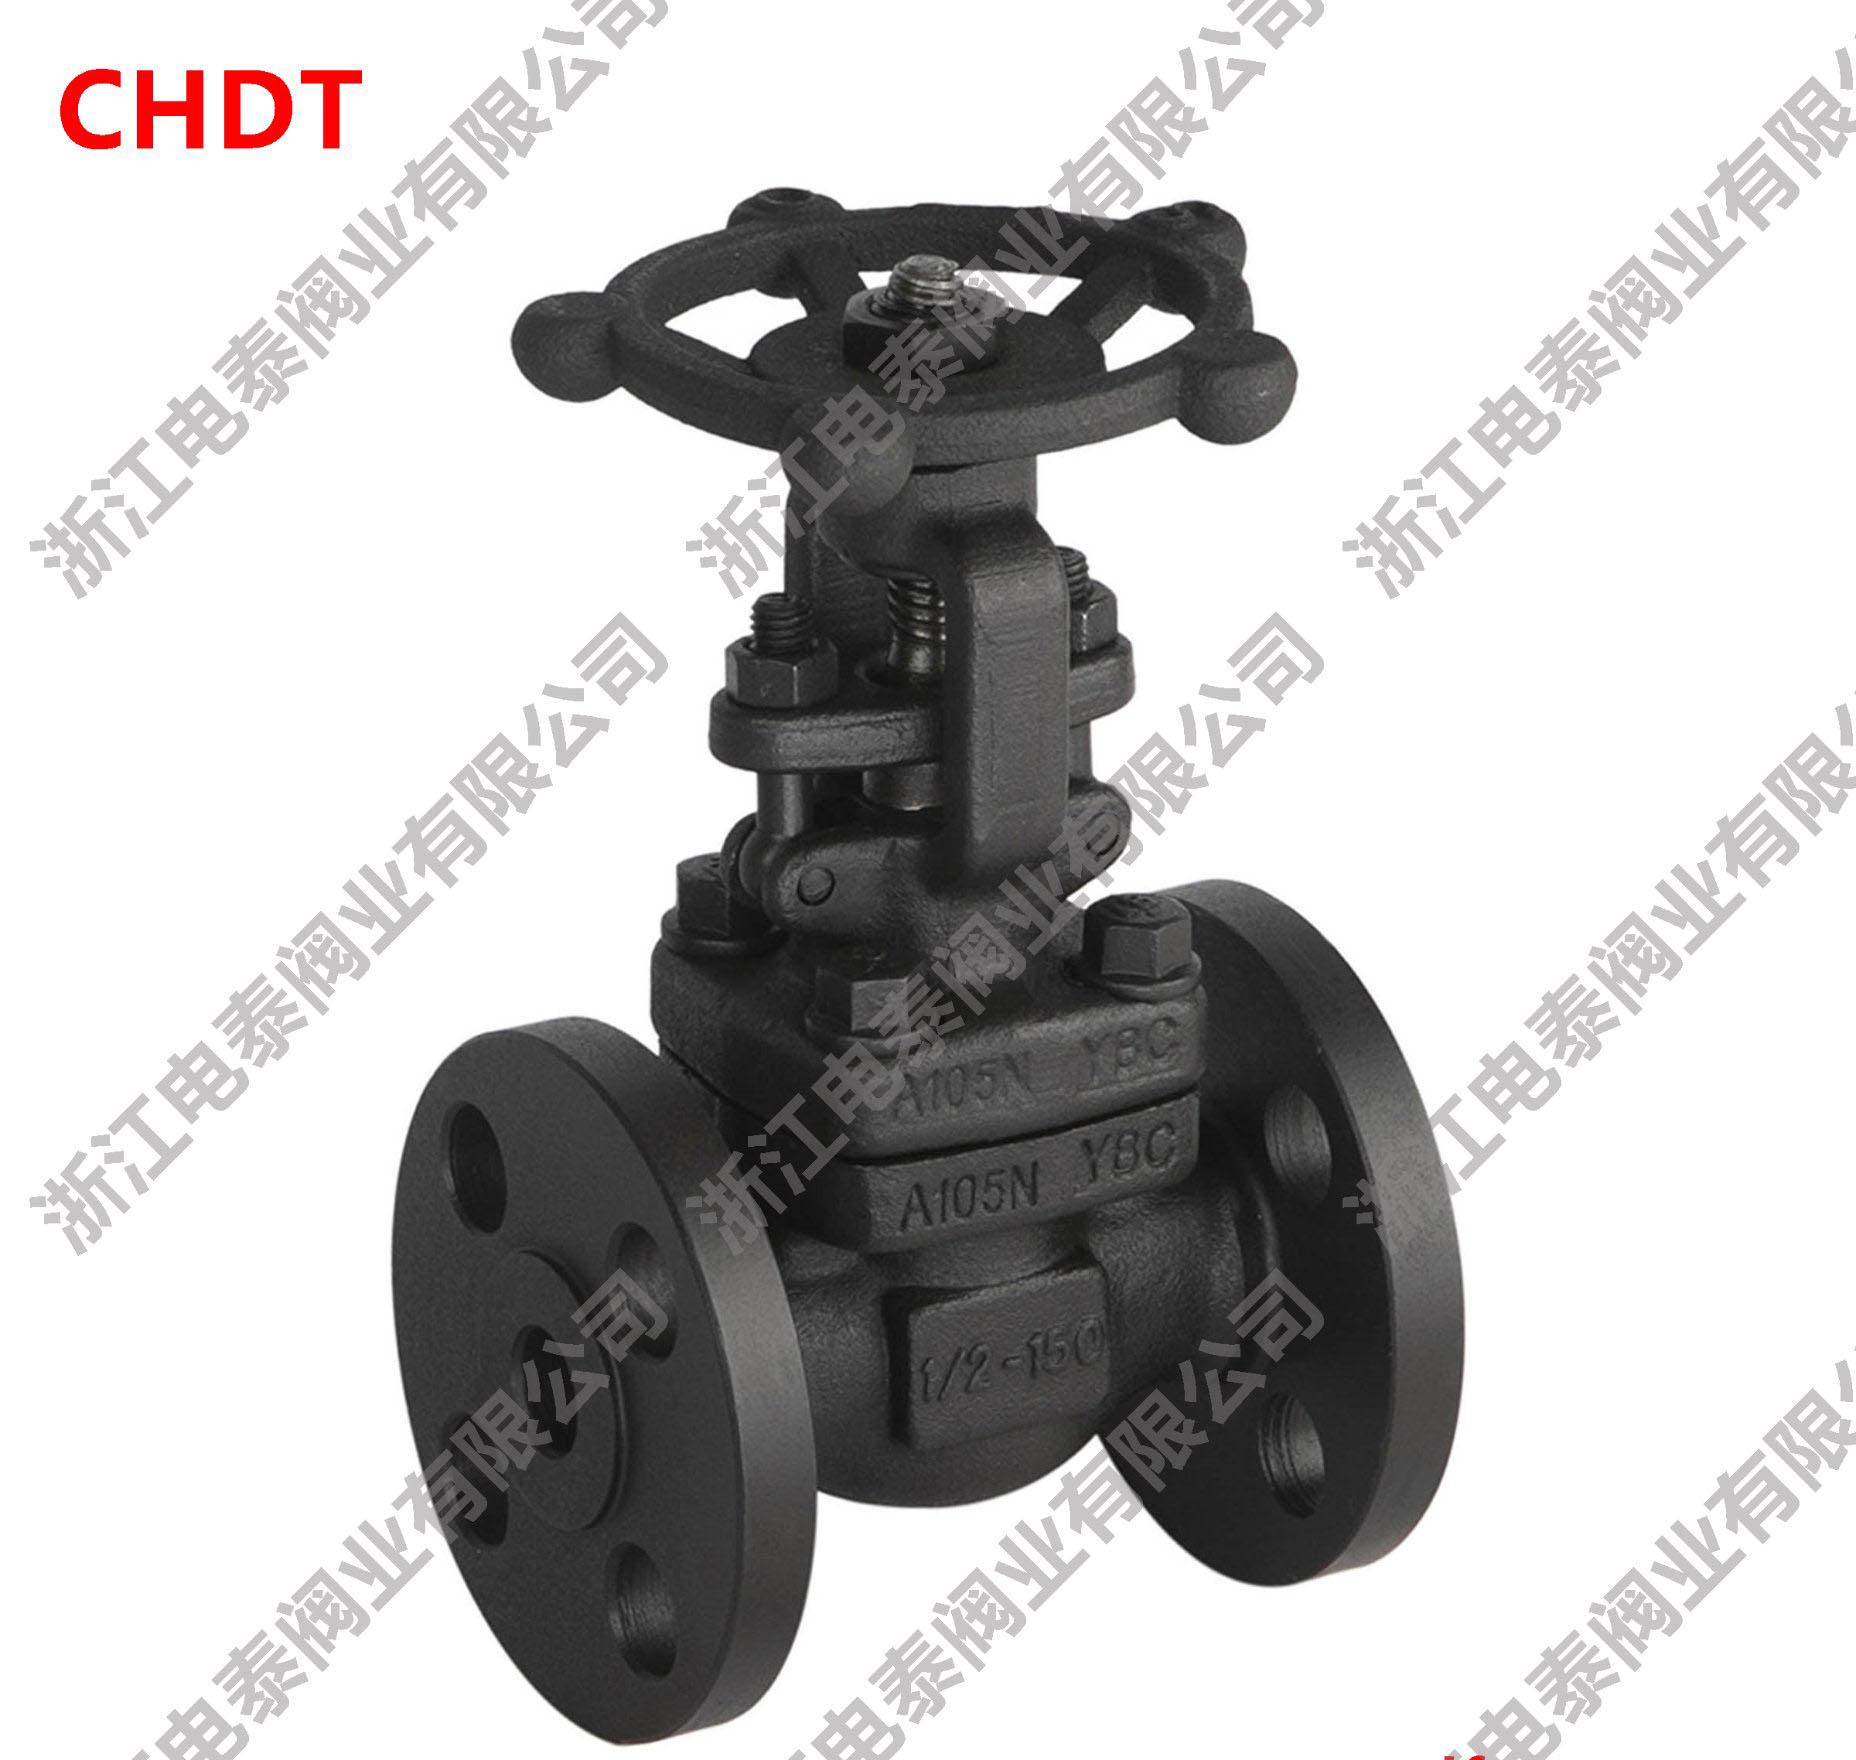 Forged Steel Valve - Zhejiang Diantai Valve Co., Ltd.